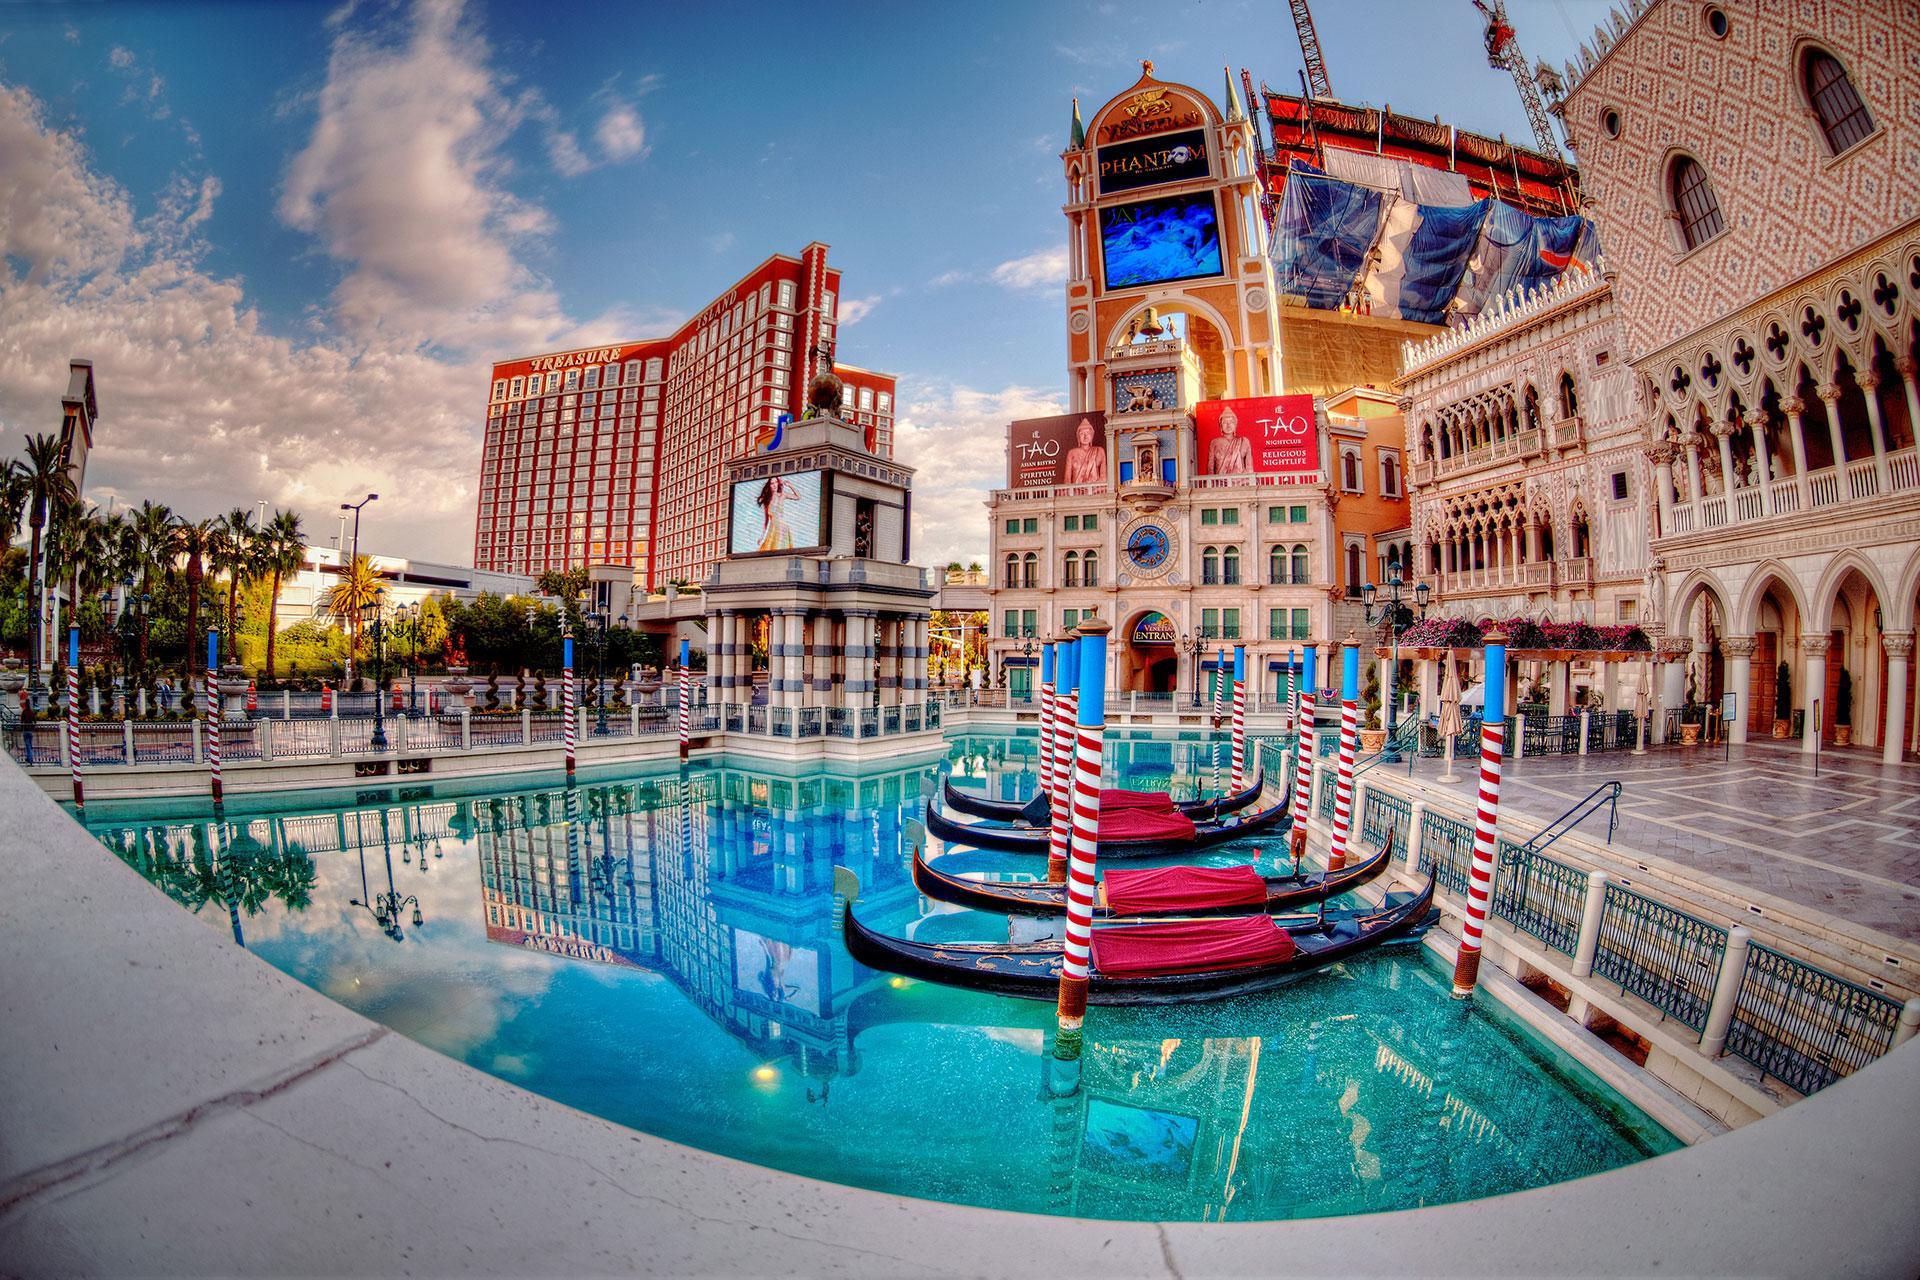 Las Vegas' Venetian Hotel